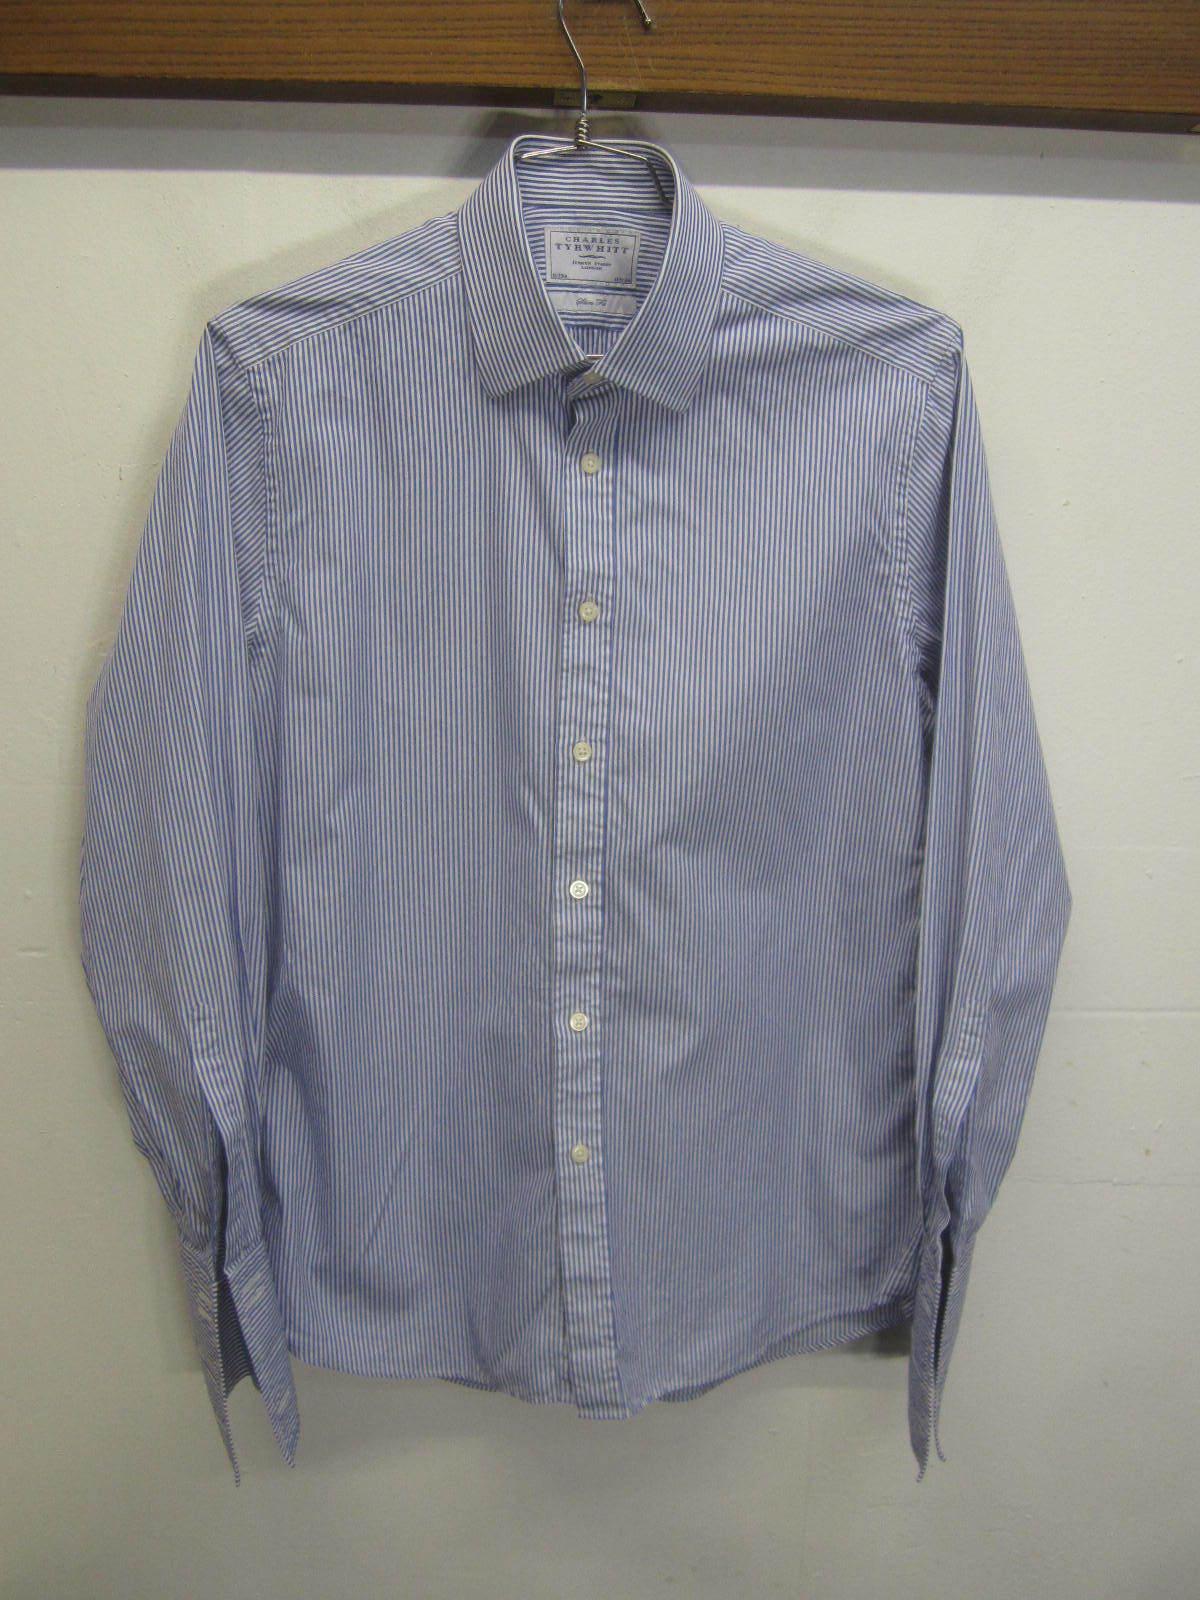 EUC Charles Tyrwhitt Dress Shirt striped cotton french cuff slim fit sz 16 - 35